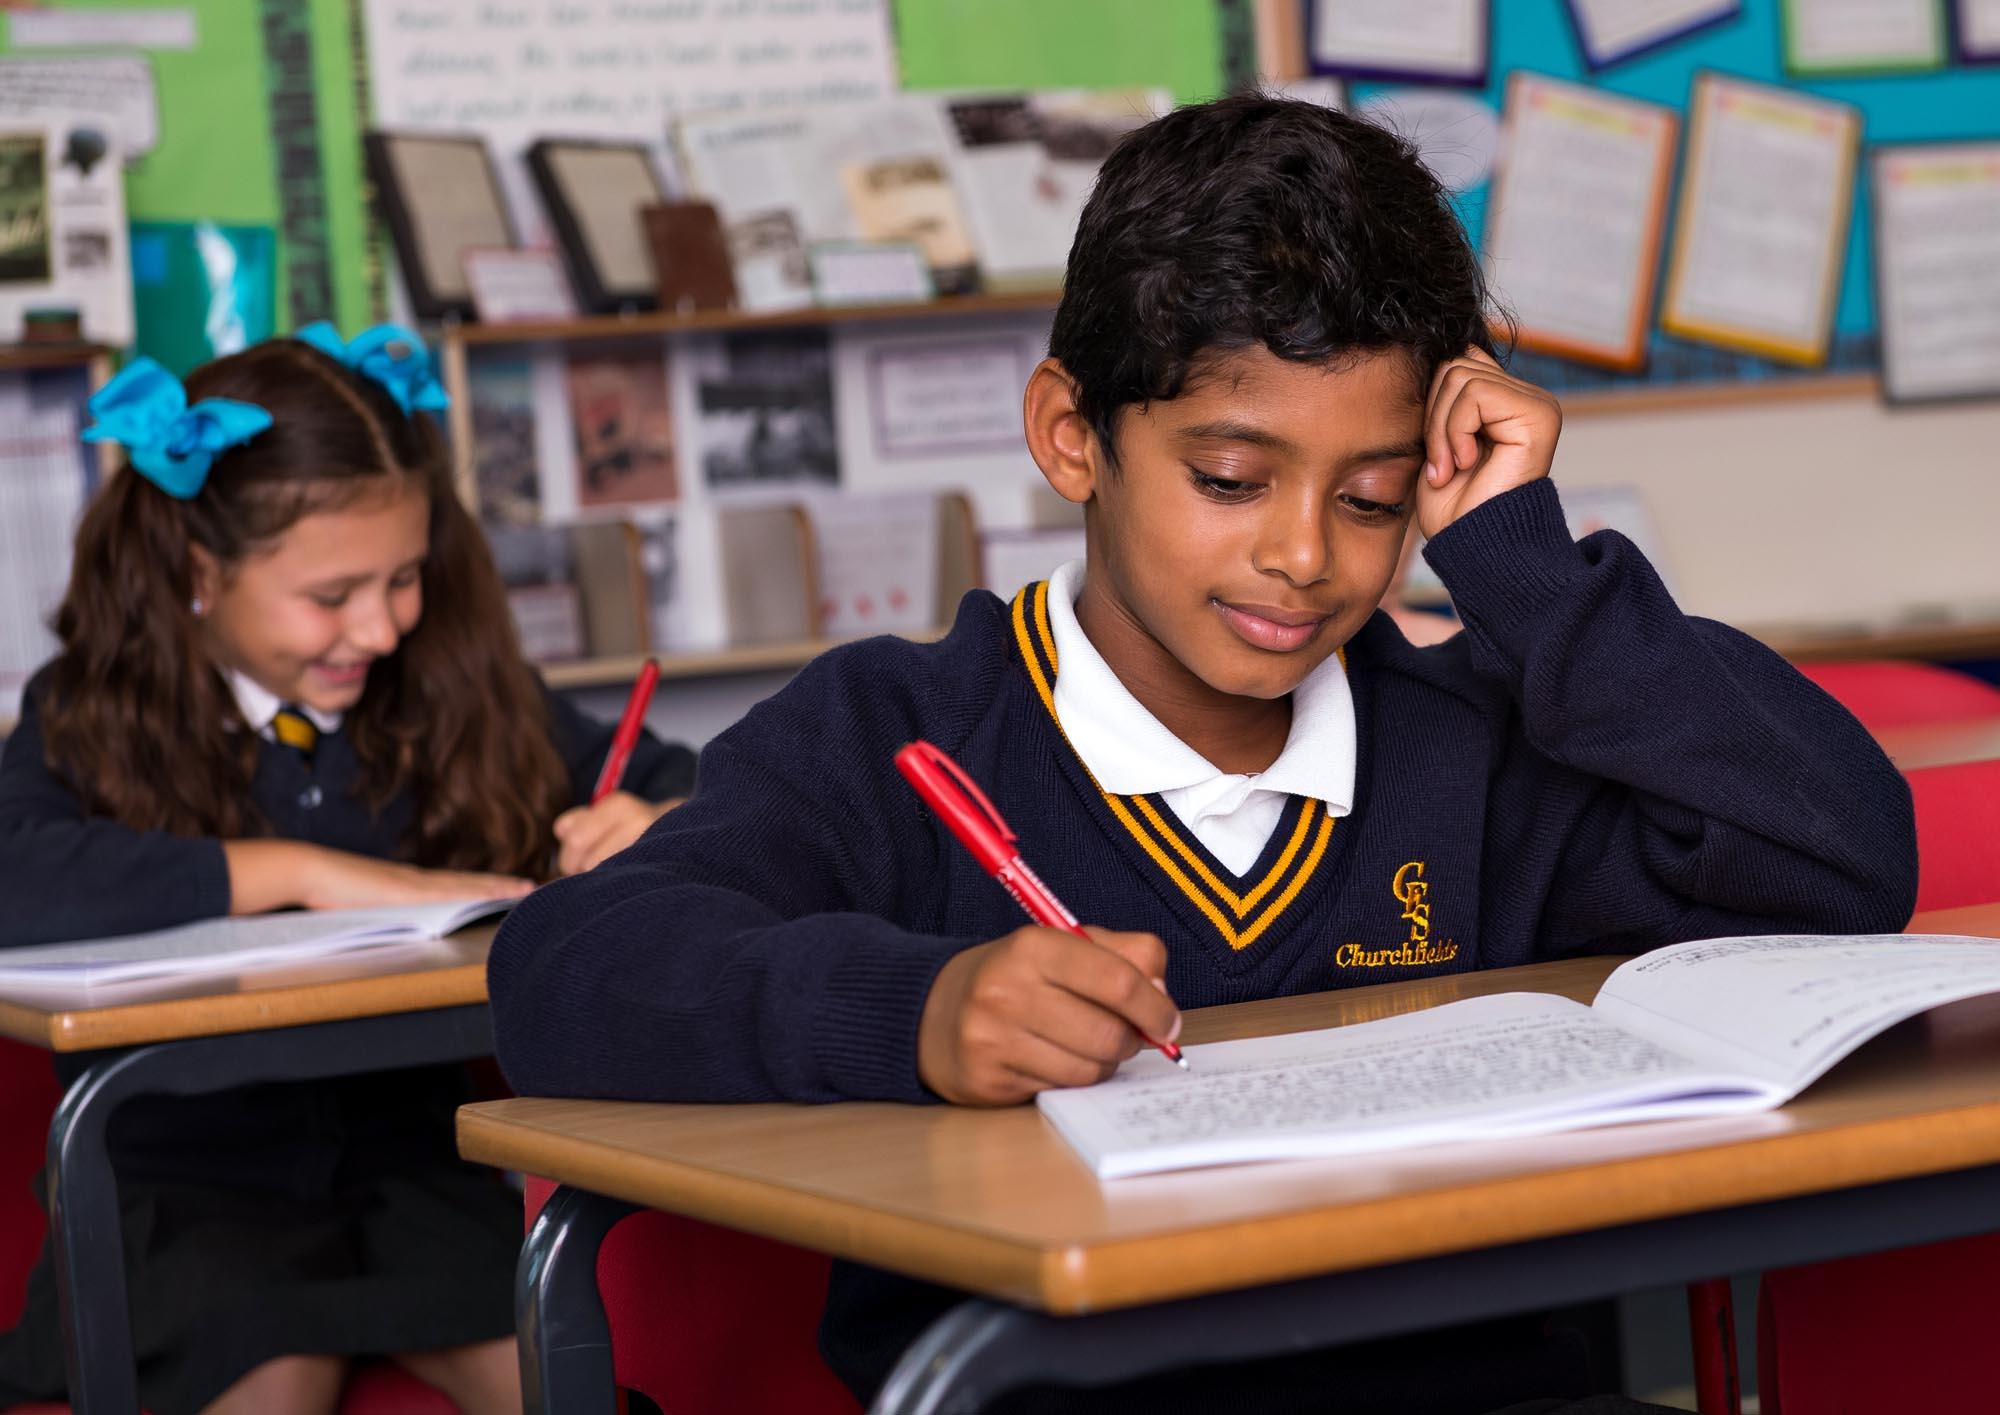 Boy thinking and writing